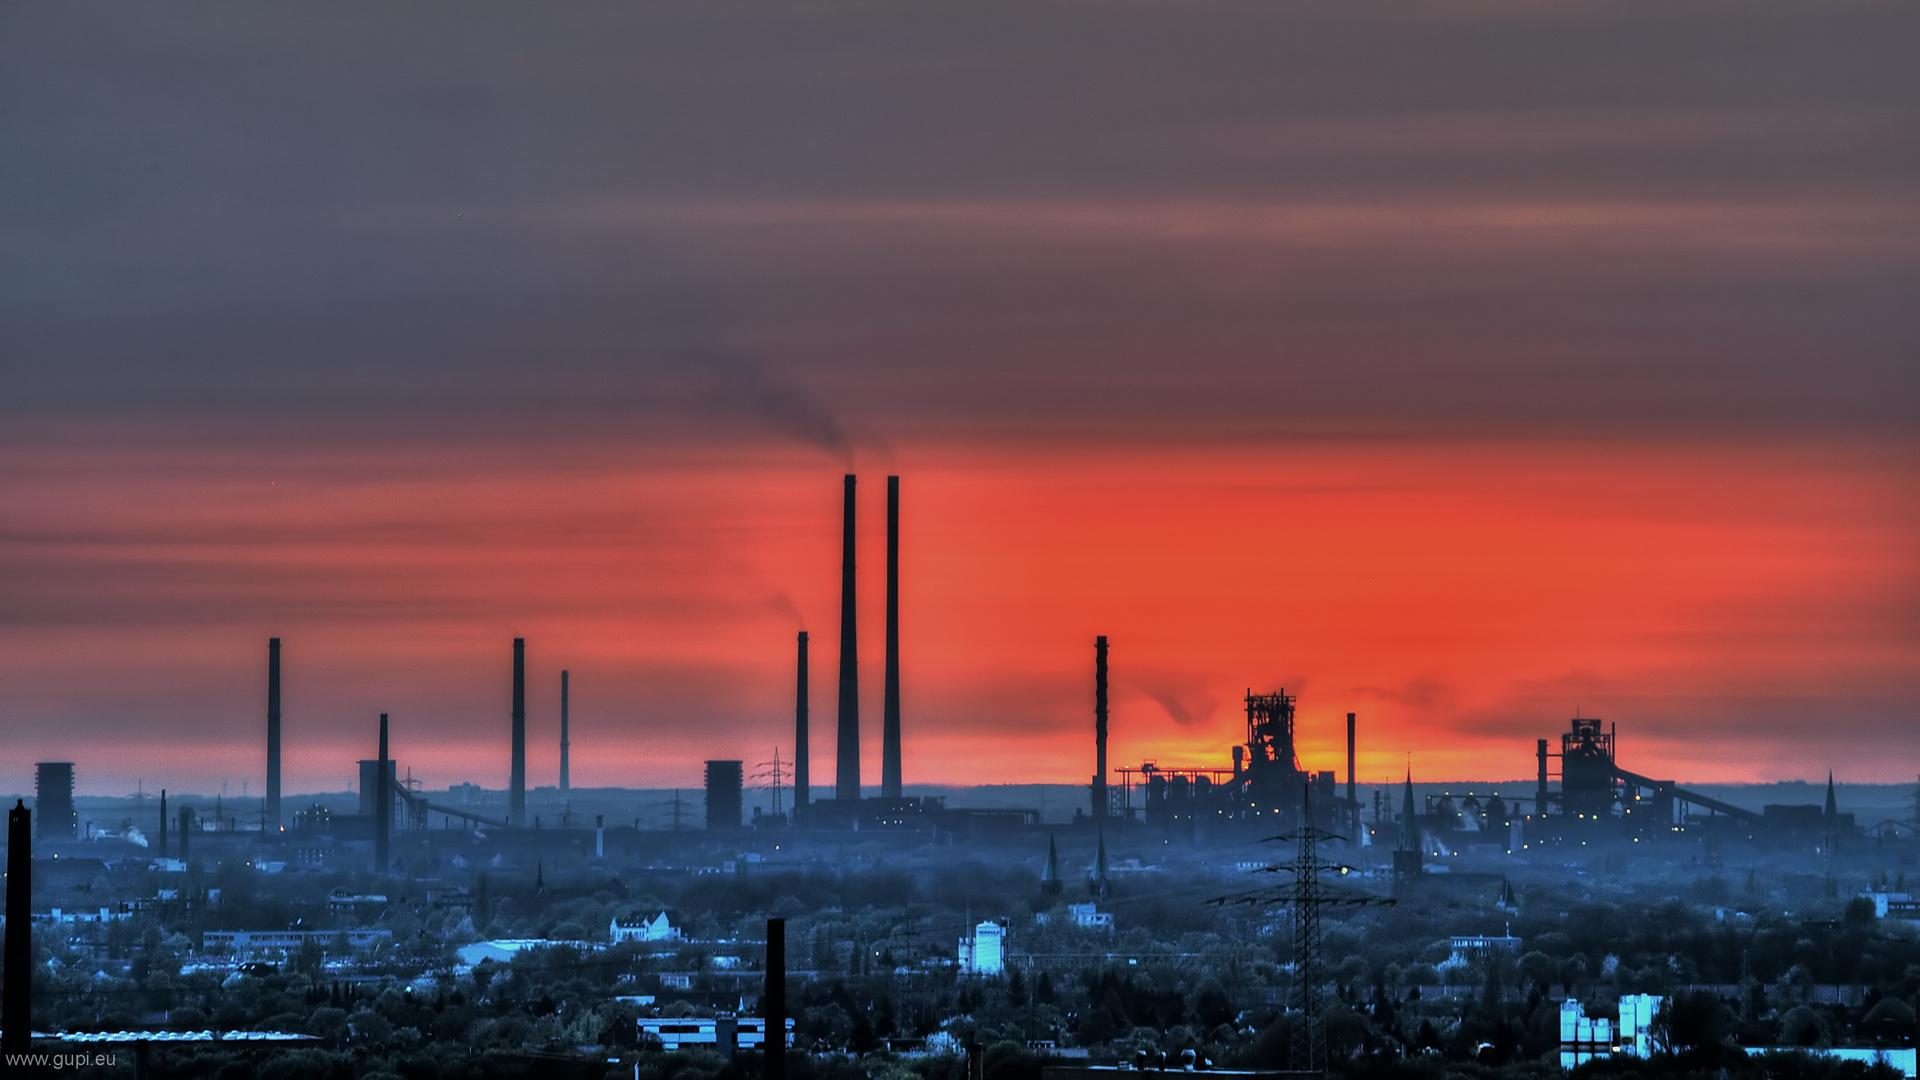 Kohlenpottromantik XVI - Weil Kitty es wollte: geHaDeRt